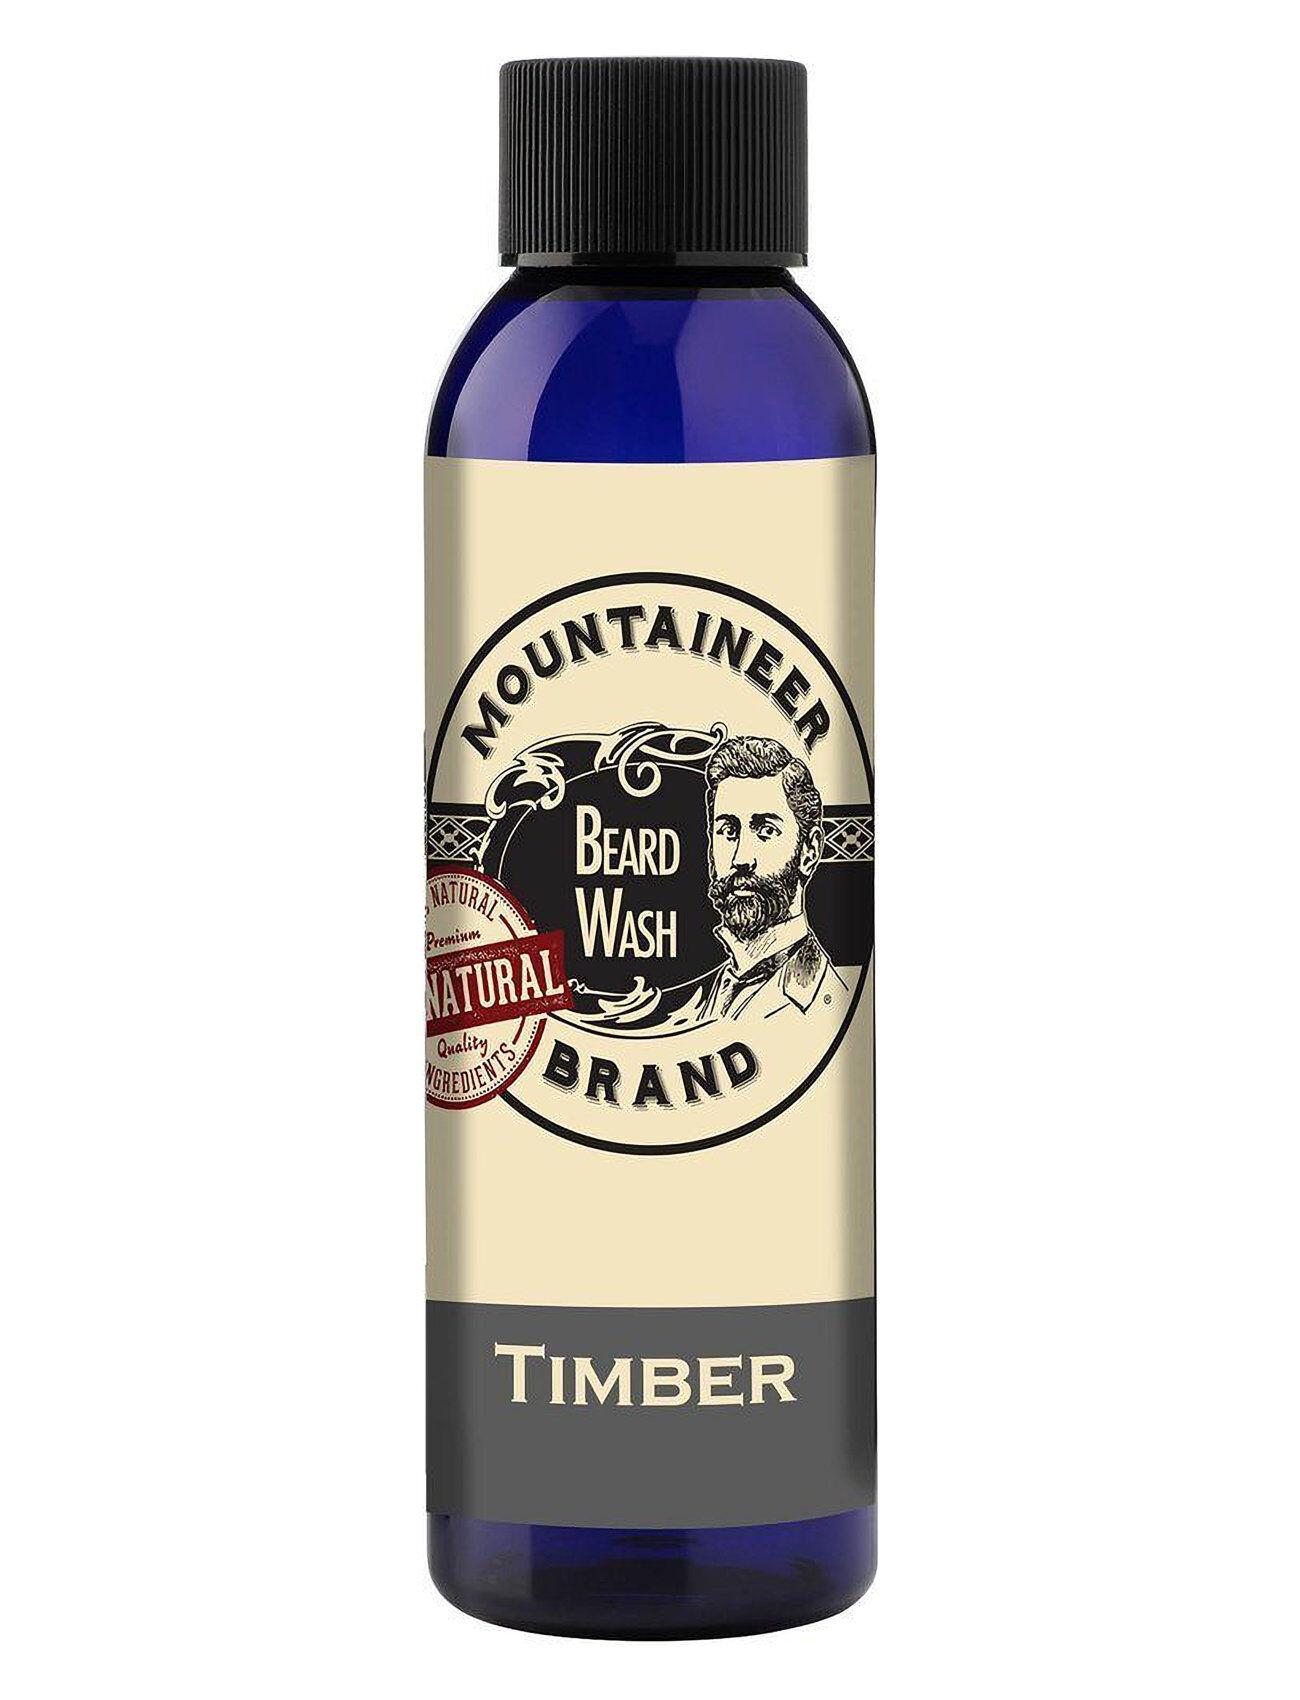 Mountaineer Brand Timber Beard Wash Beauty MEN Shaving Products Beard & Mustache Nude Mountaineer Brand